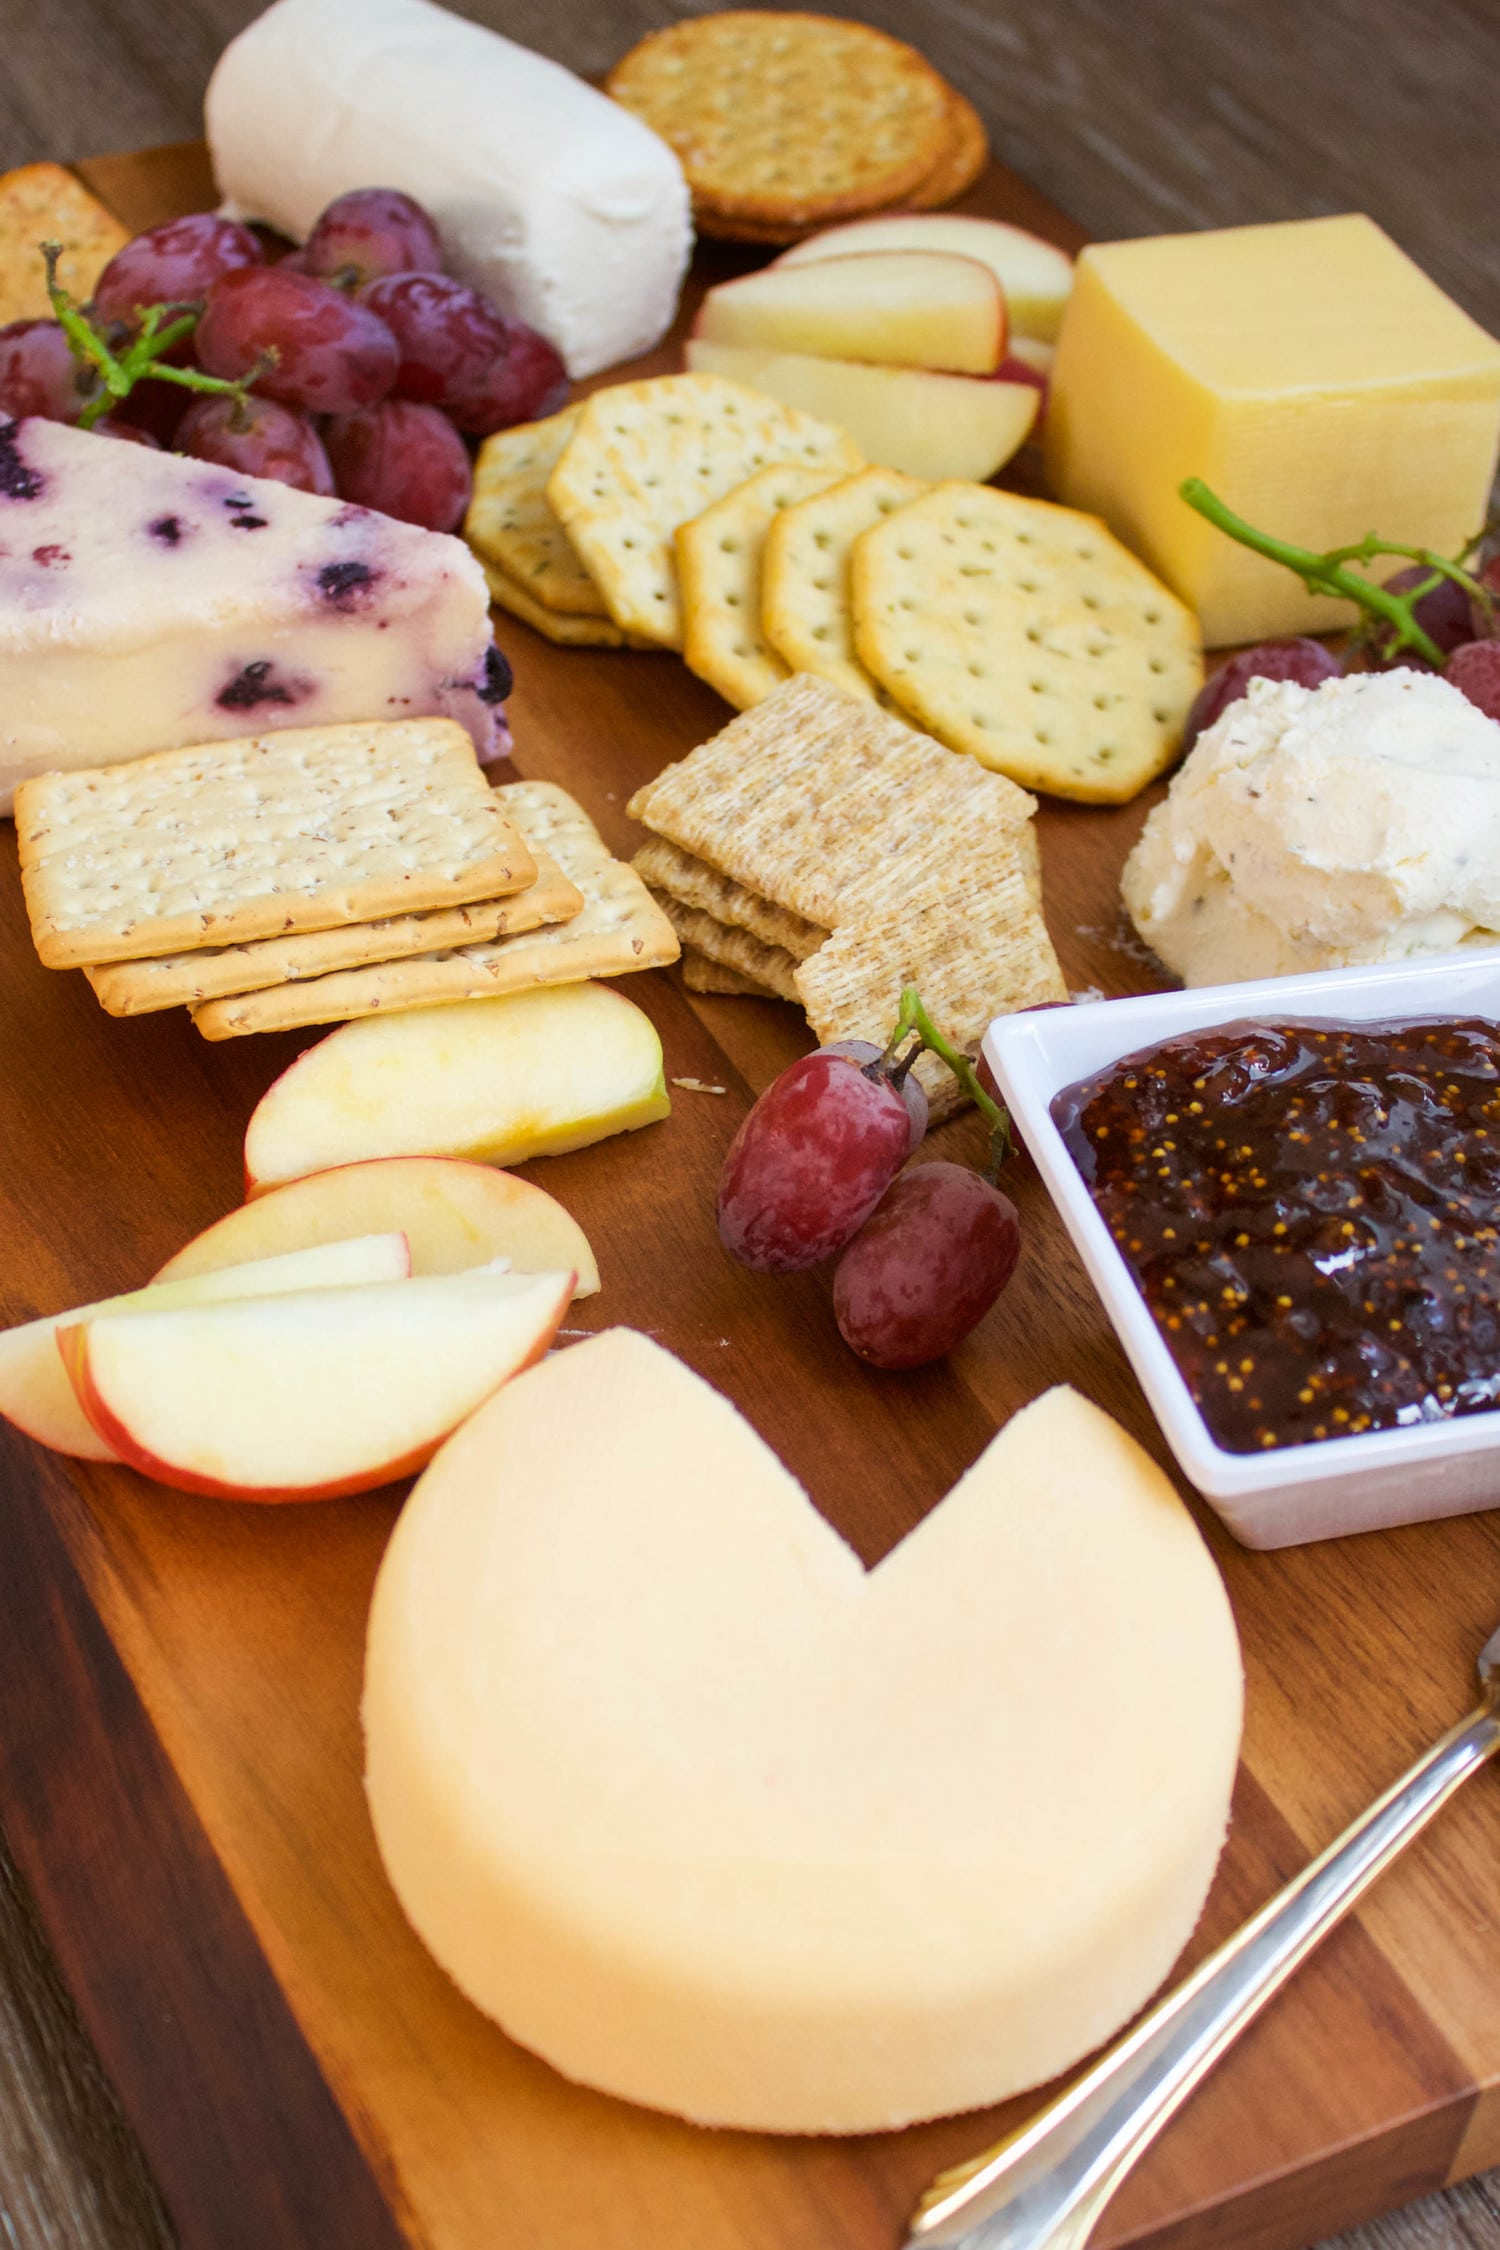 boursin garlic and herb cheese